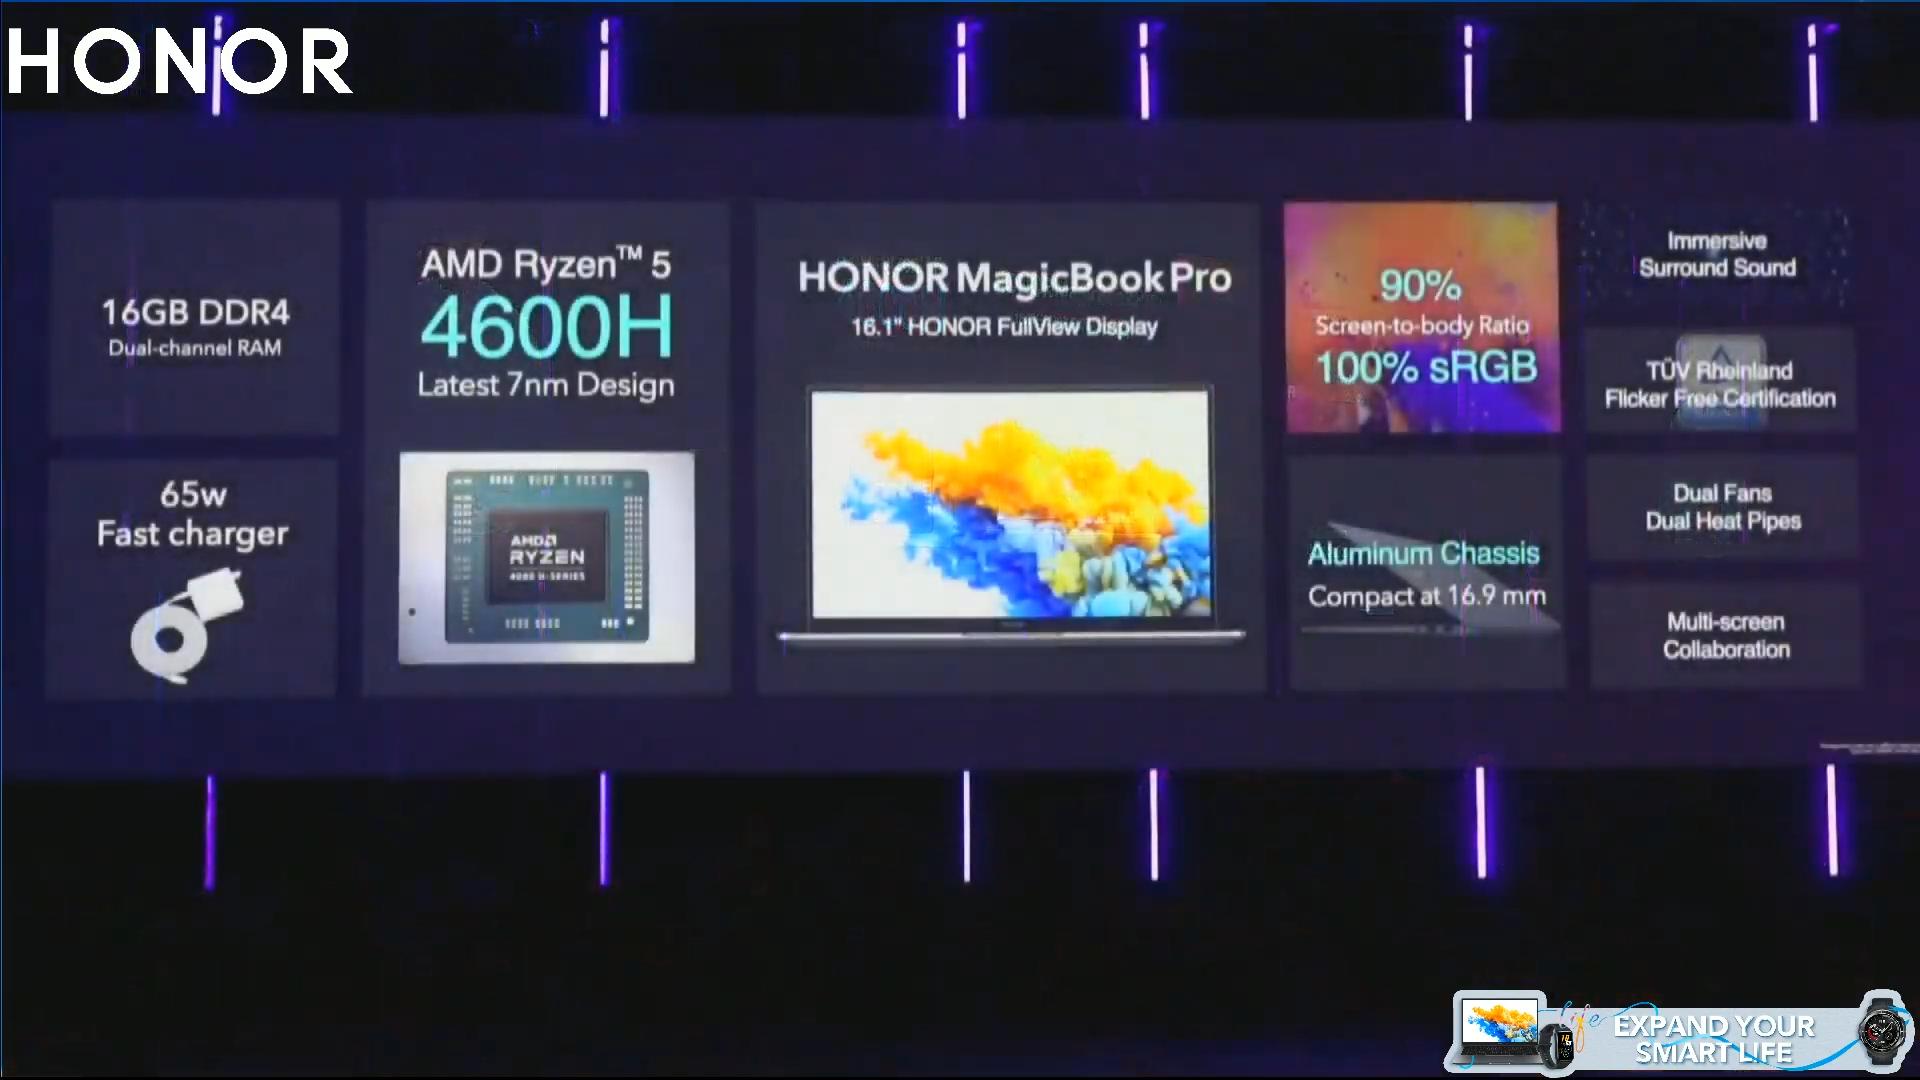 [IFA 2020] Presentati i prossimi Honor Watch, MagicBook e Pad 6 5